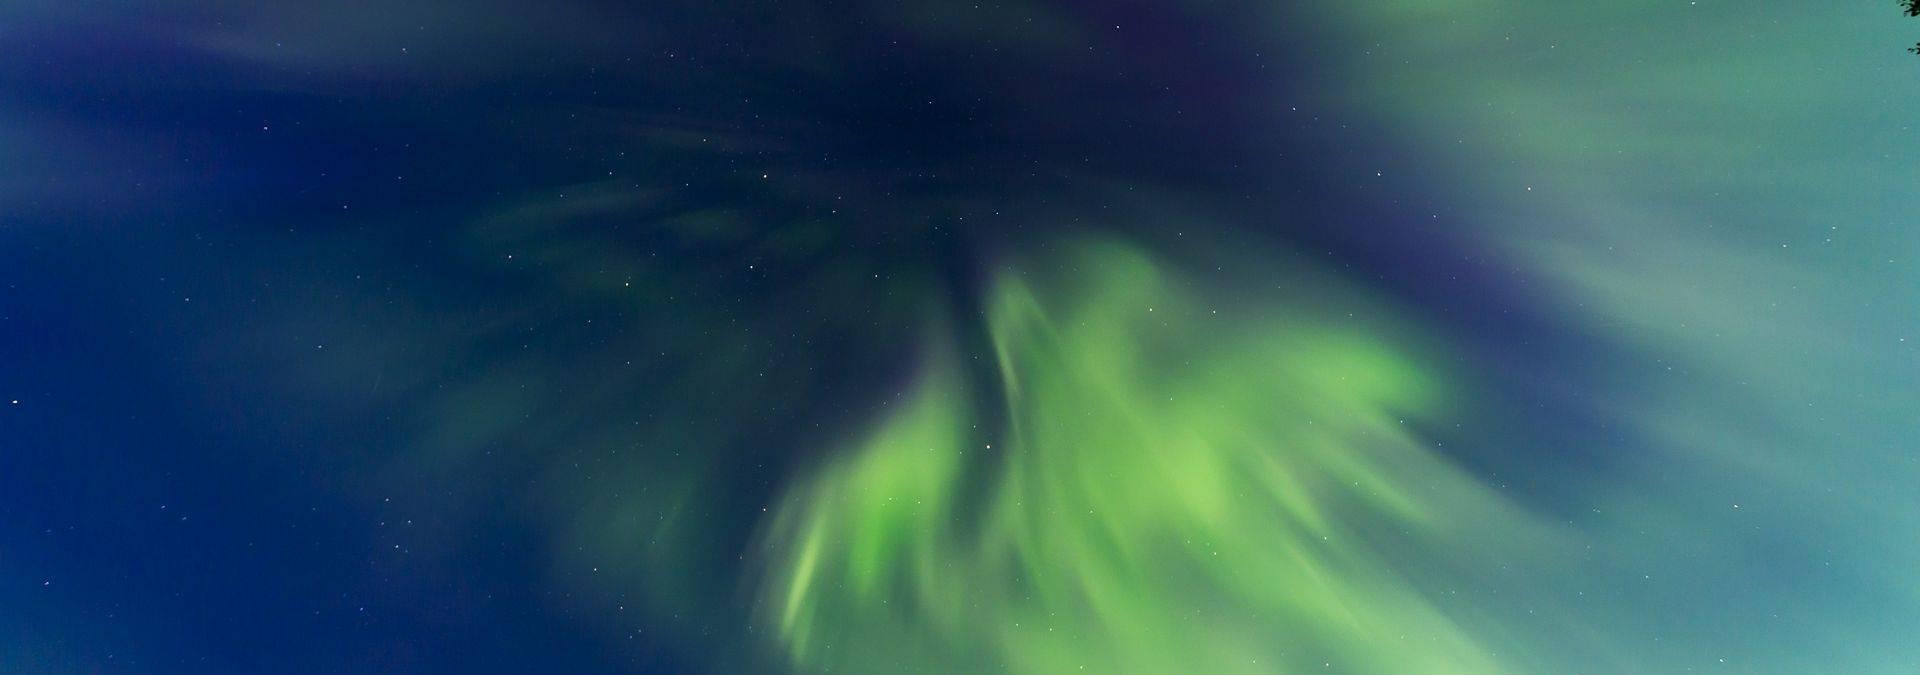 northern-lights-fall-icehotel-3.jpg Credit Tomas Jönsson & ICEHOTEL.jpg